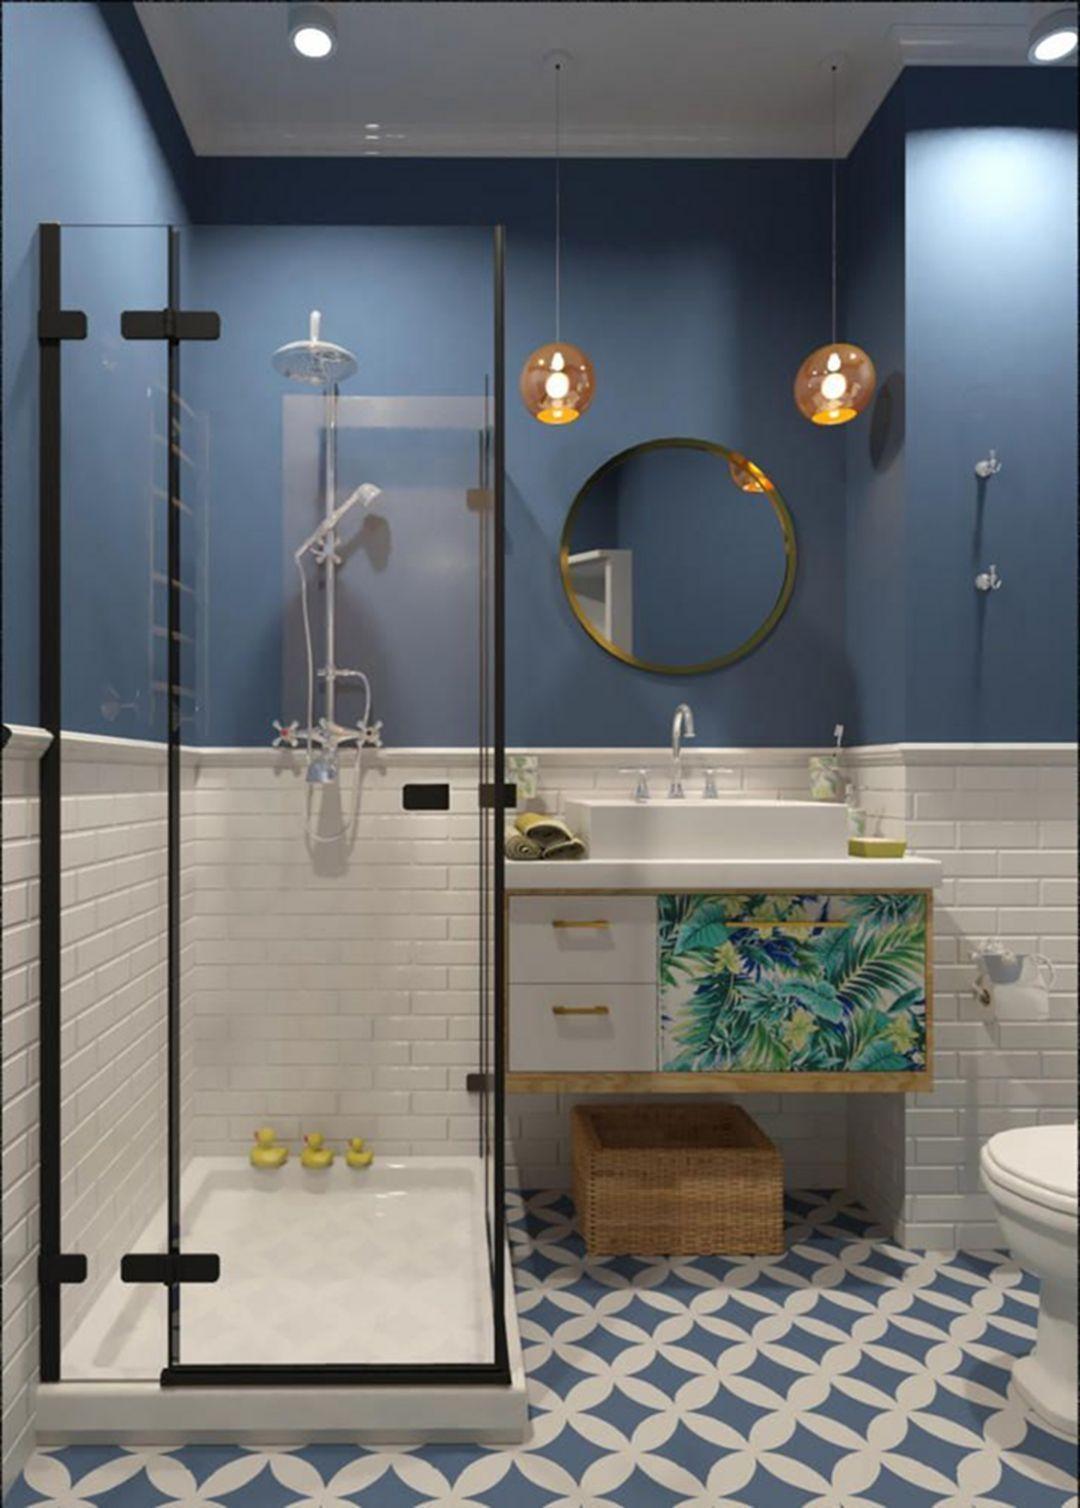 Amazing Small Bathroom Wall Tiles 241018 | Small bathroom ... on Amazing Small Bathrooms  id=27102